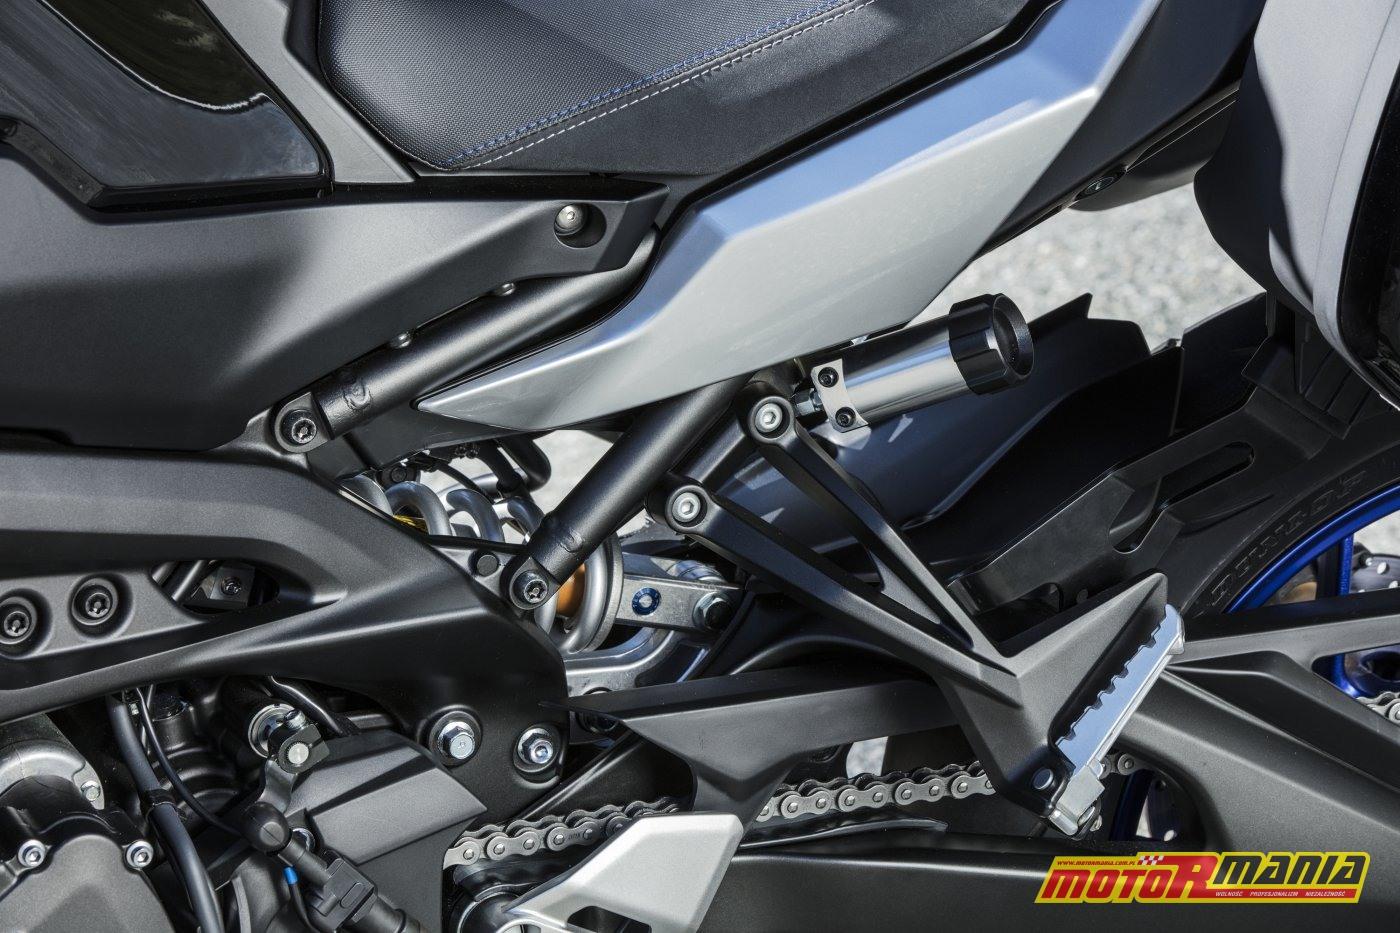 Yamaha Tracer 900 GT 2018 (11)